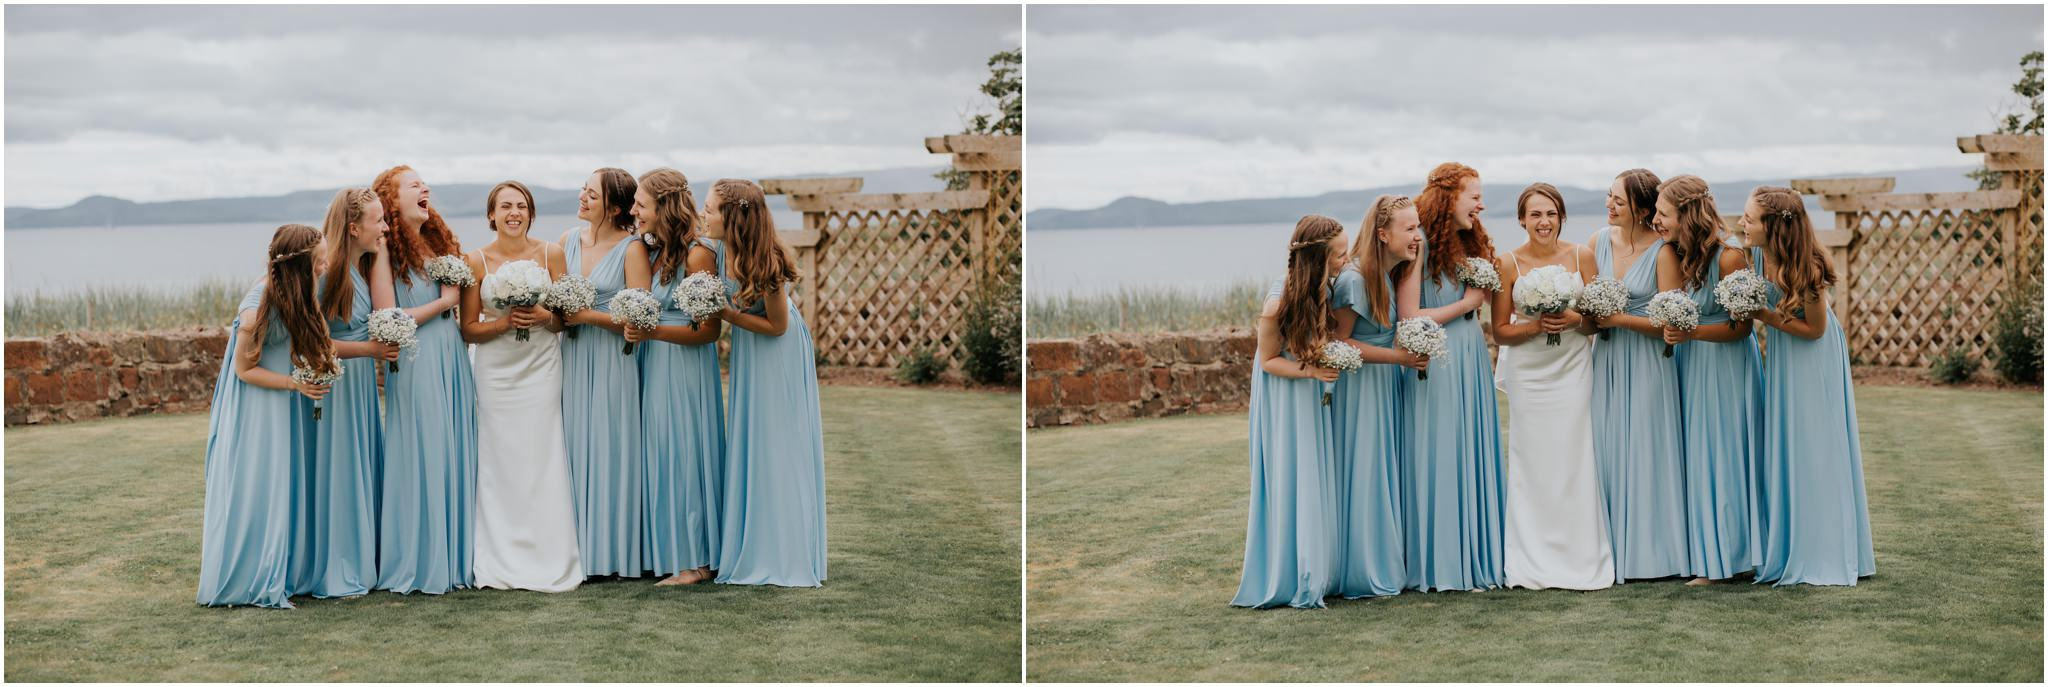 Photography 78 - Glasgow Wedding Photographer - Jordan & Abi - The Waterside Hotel, West Kilbride_0094.jpg